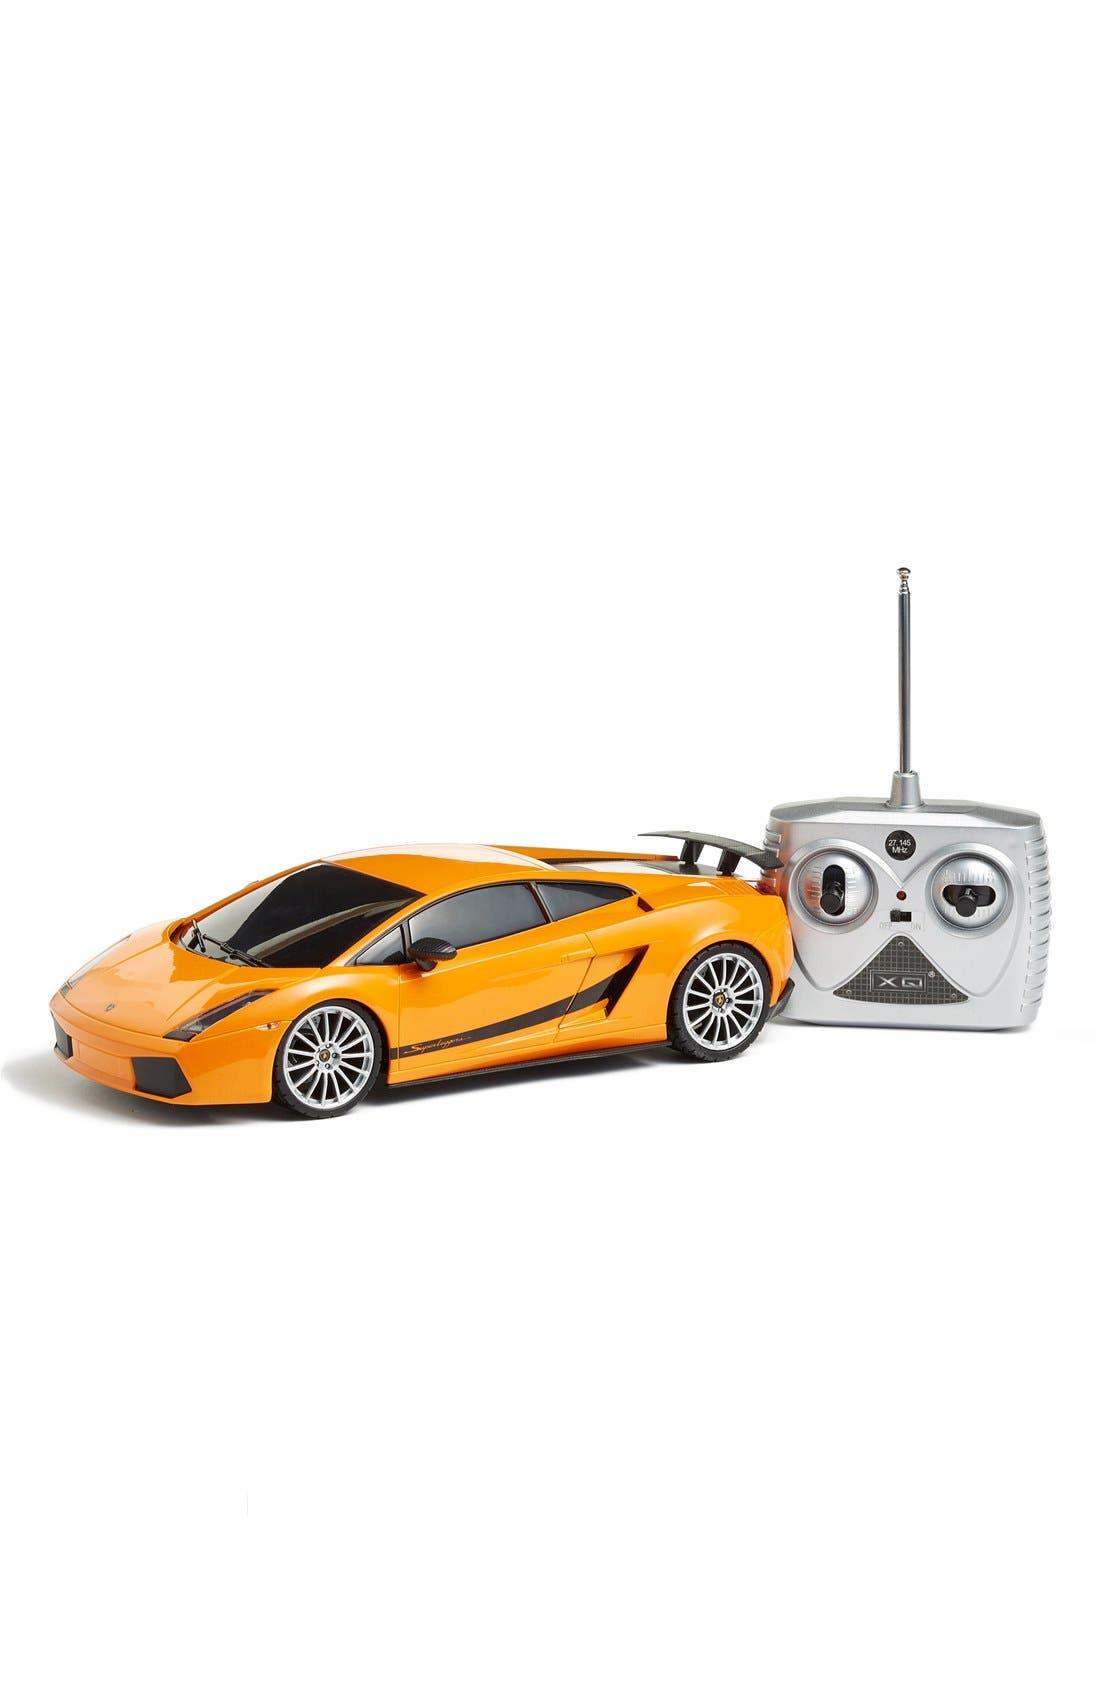 Lamborghini Superleggera 1:18 Scale Remote Control Car Toy,                             Main thumbnail 1, color,                             800